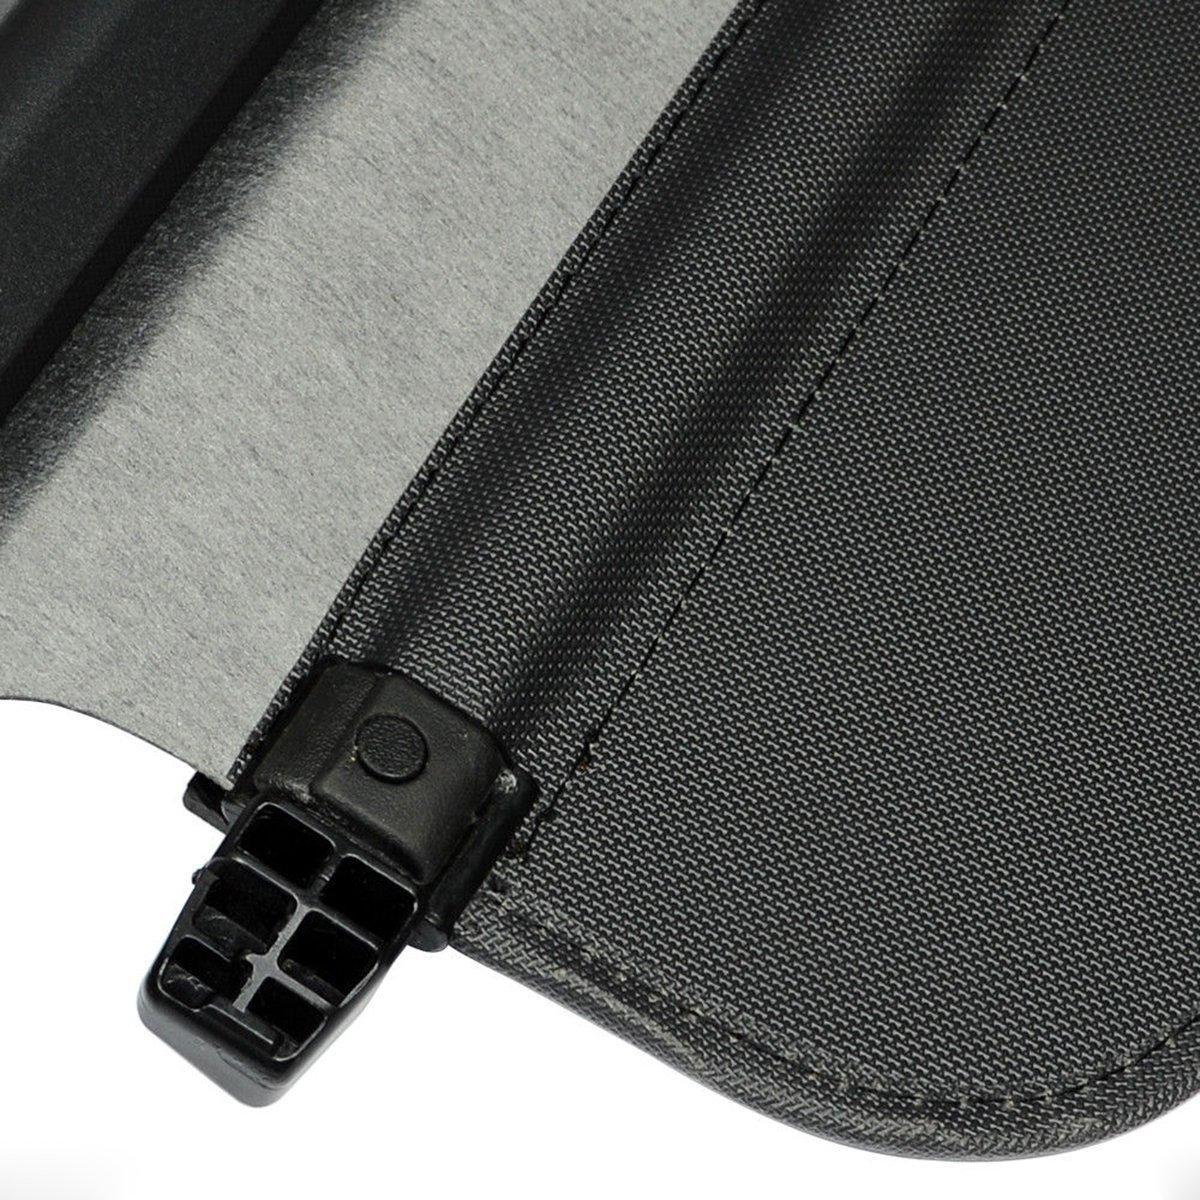 TMB Motorsports Cargo Cover for 2015 2016 Hyundai Tucson Retractable Tonneau Shield